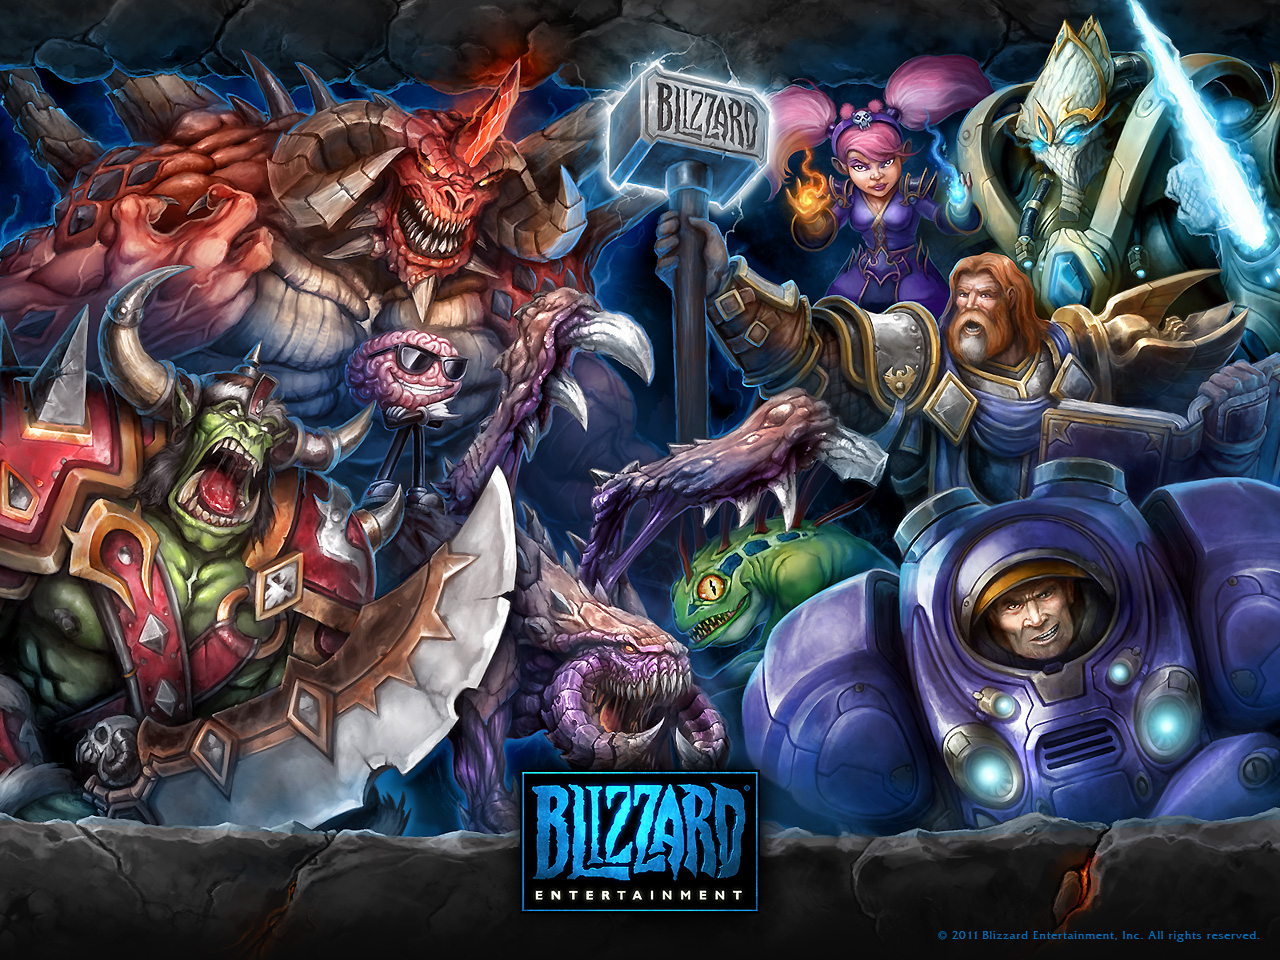 Blizzard Entertainment Wallpaper 1280x960 Blizzard Entertainment 1280x960